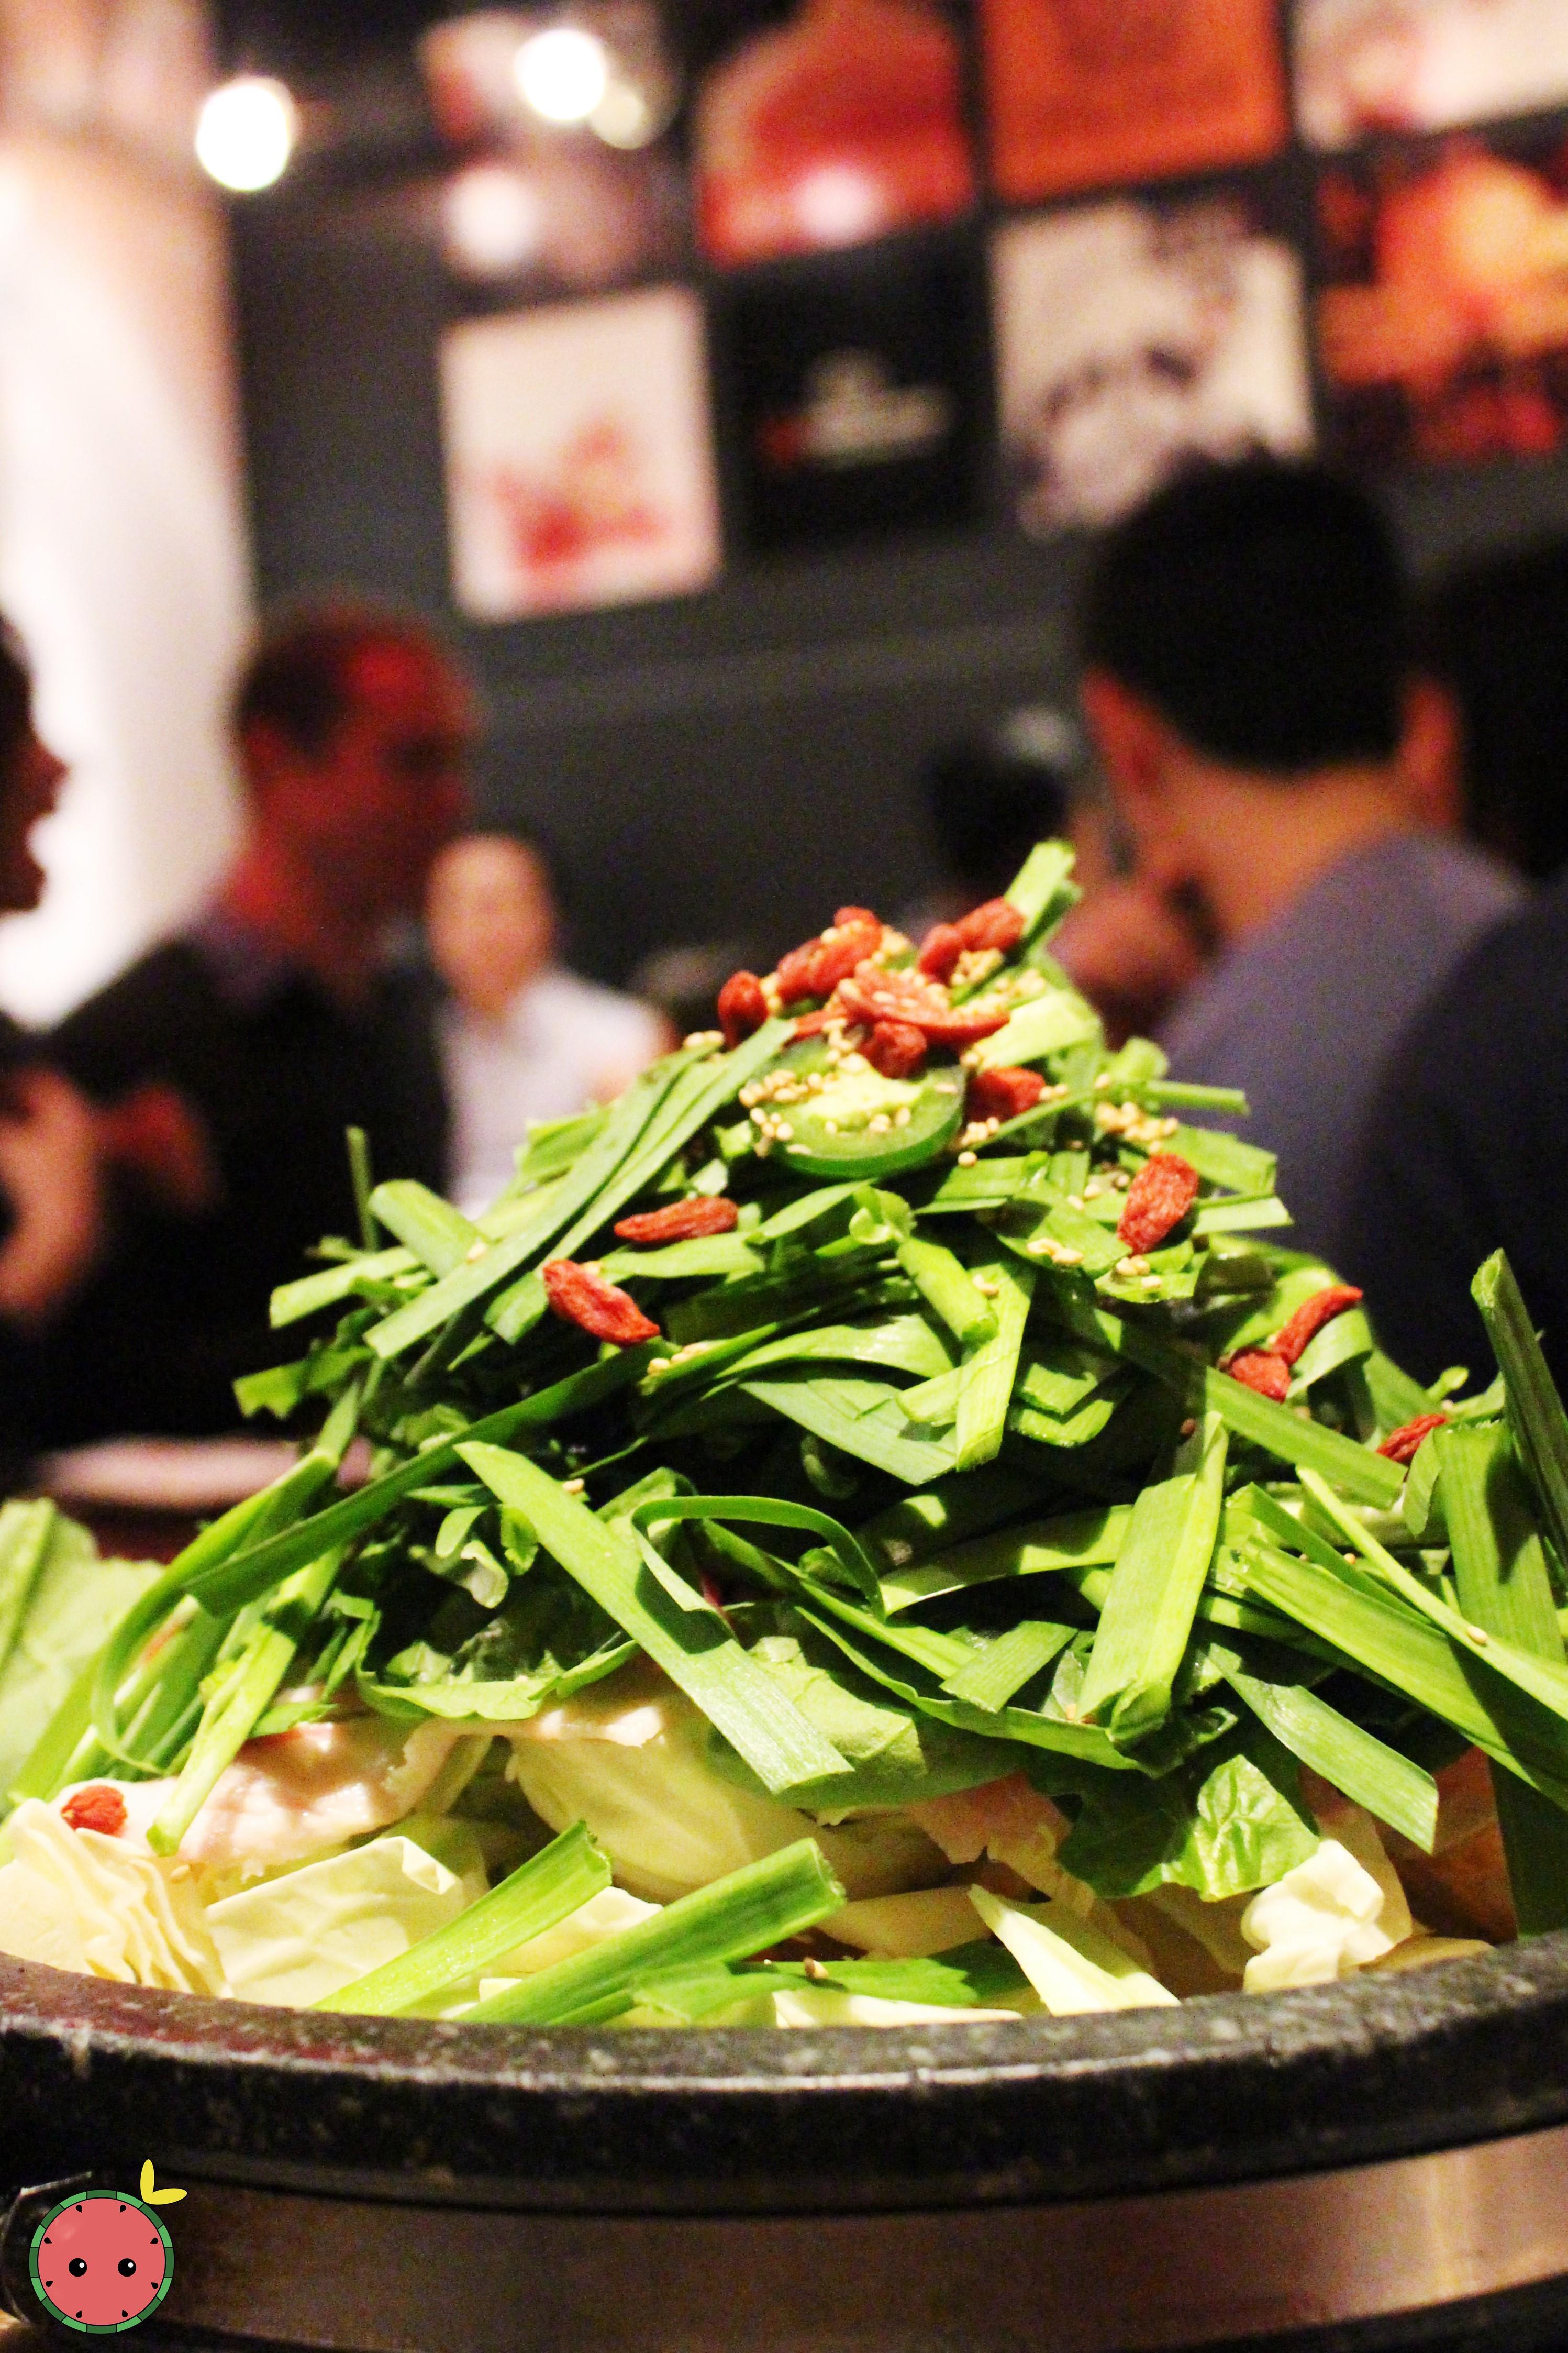 Hakata Tonton Hot Pot - A specialty of Hakata, Japan - Collagen broth, tofu, dumplings, vegetables,